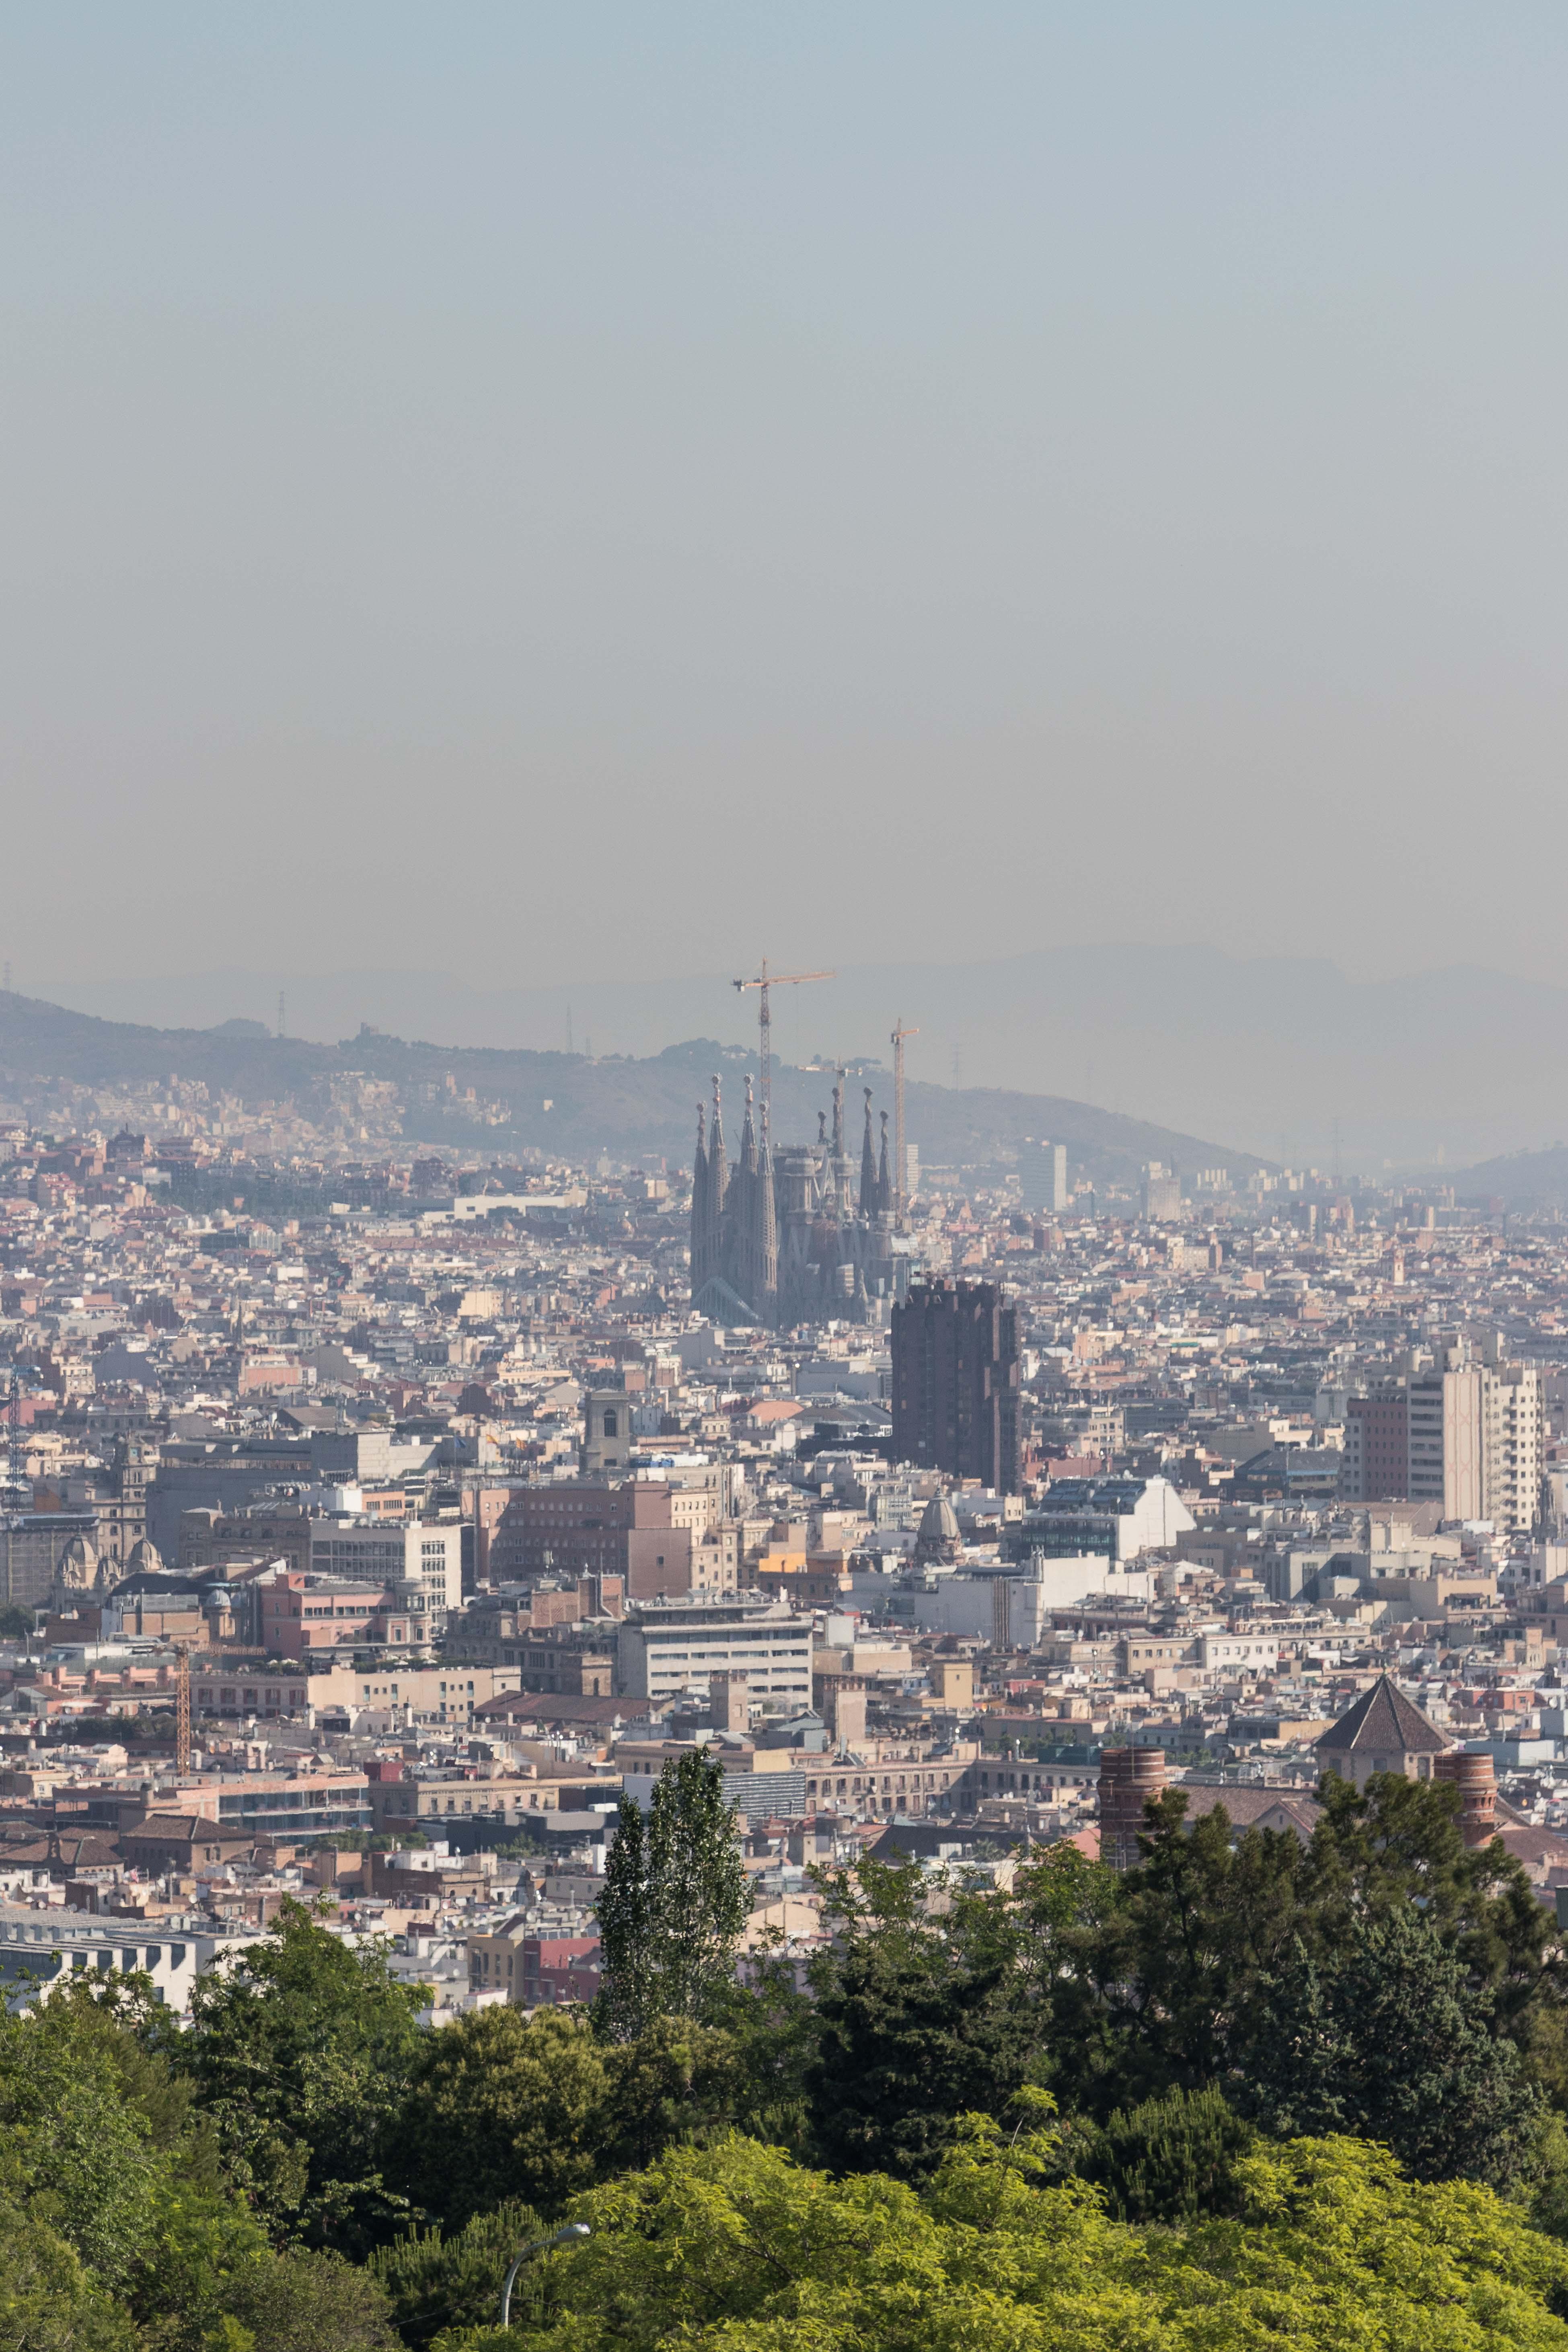 Barcelona Skyline in the Morning   https://www.roseclearfield.com